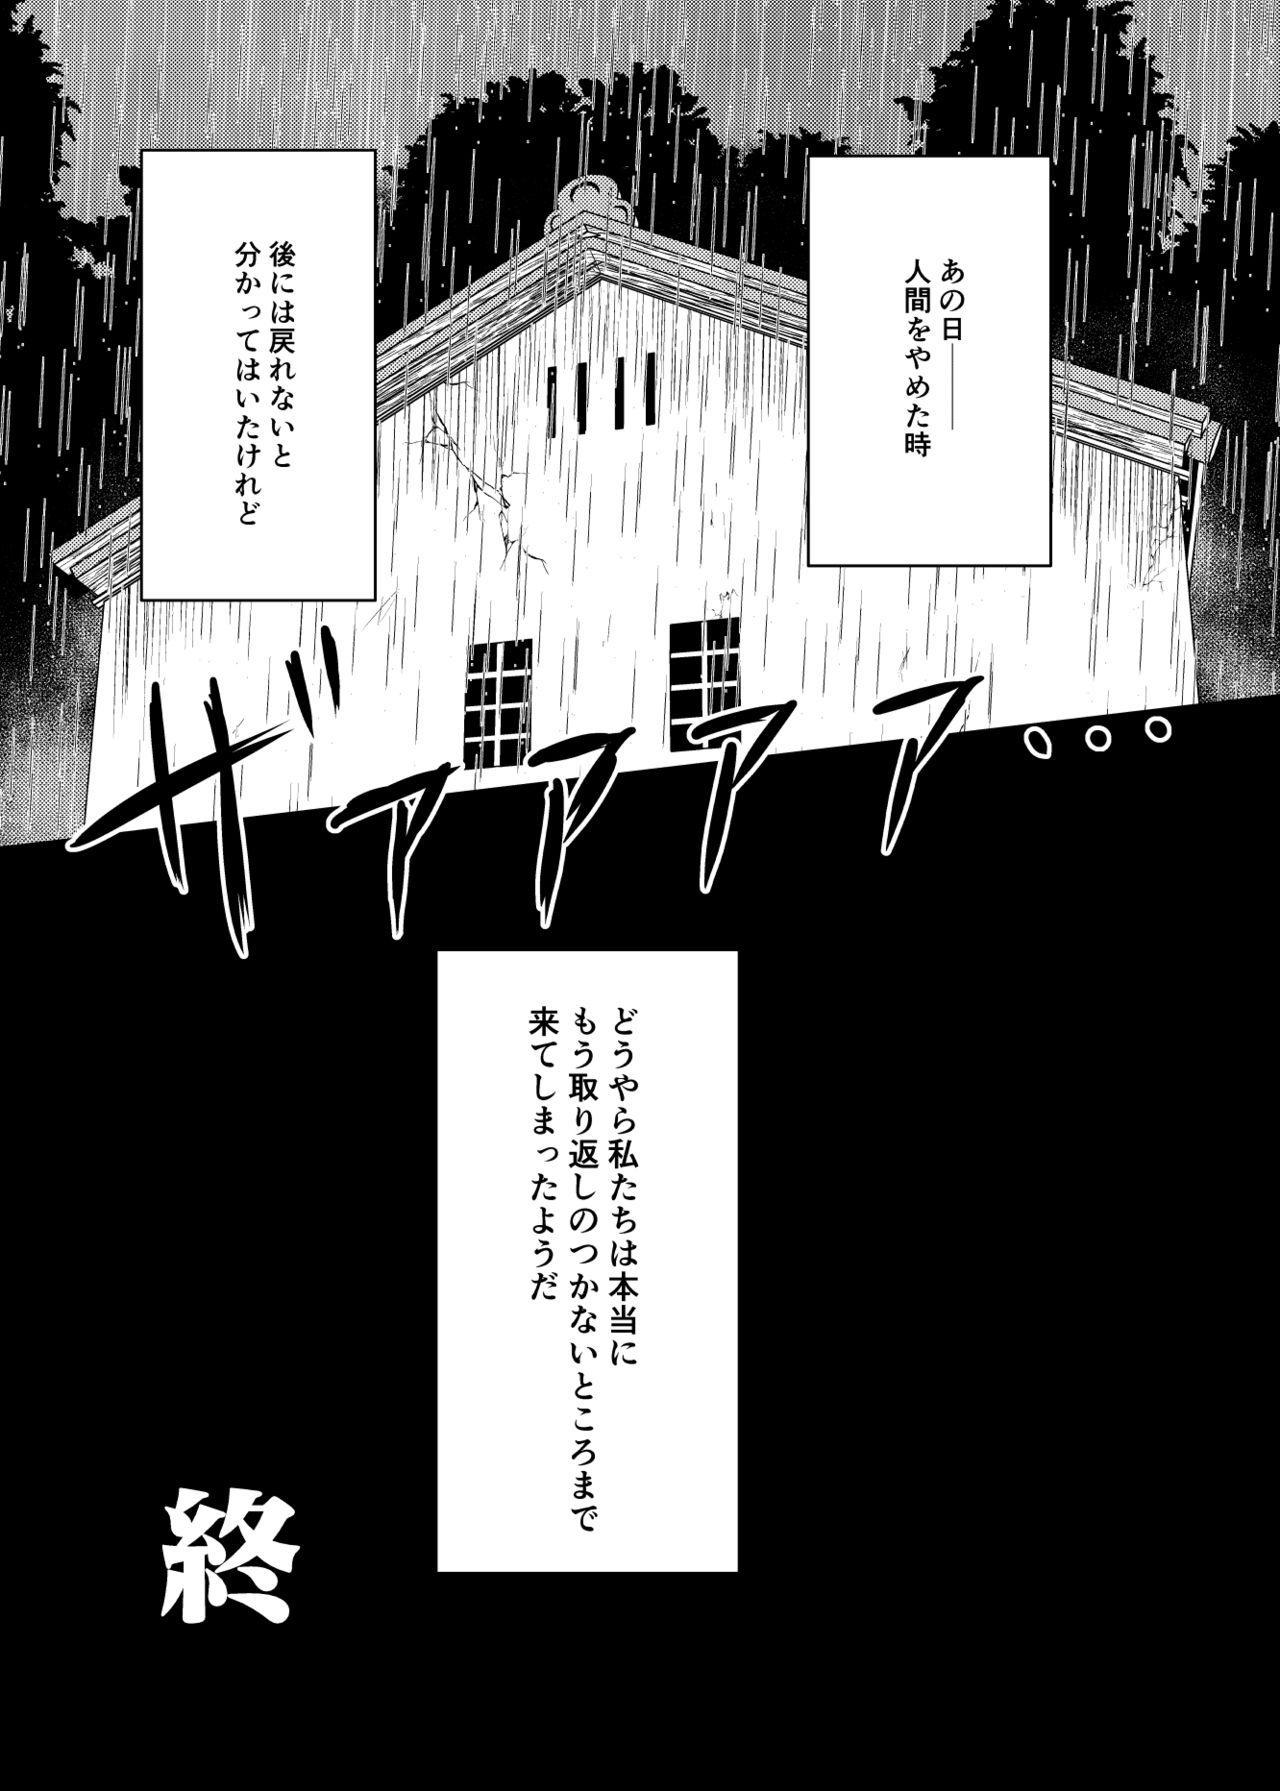 Kikan Funou Kenkaiten 32